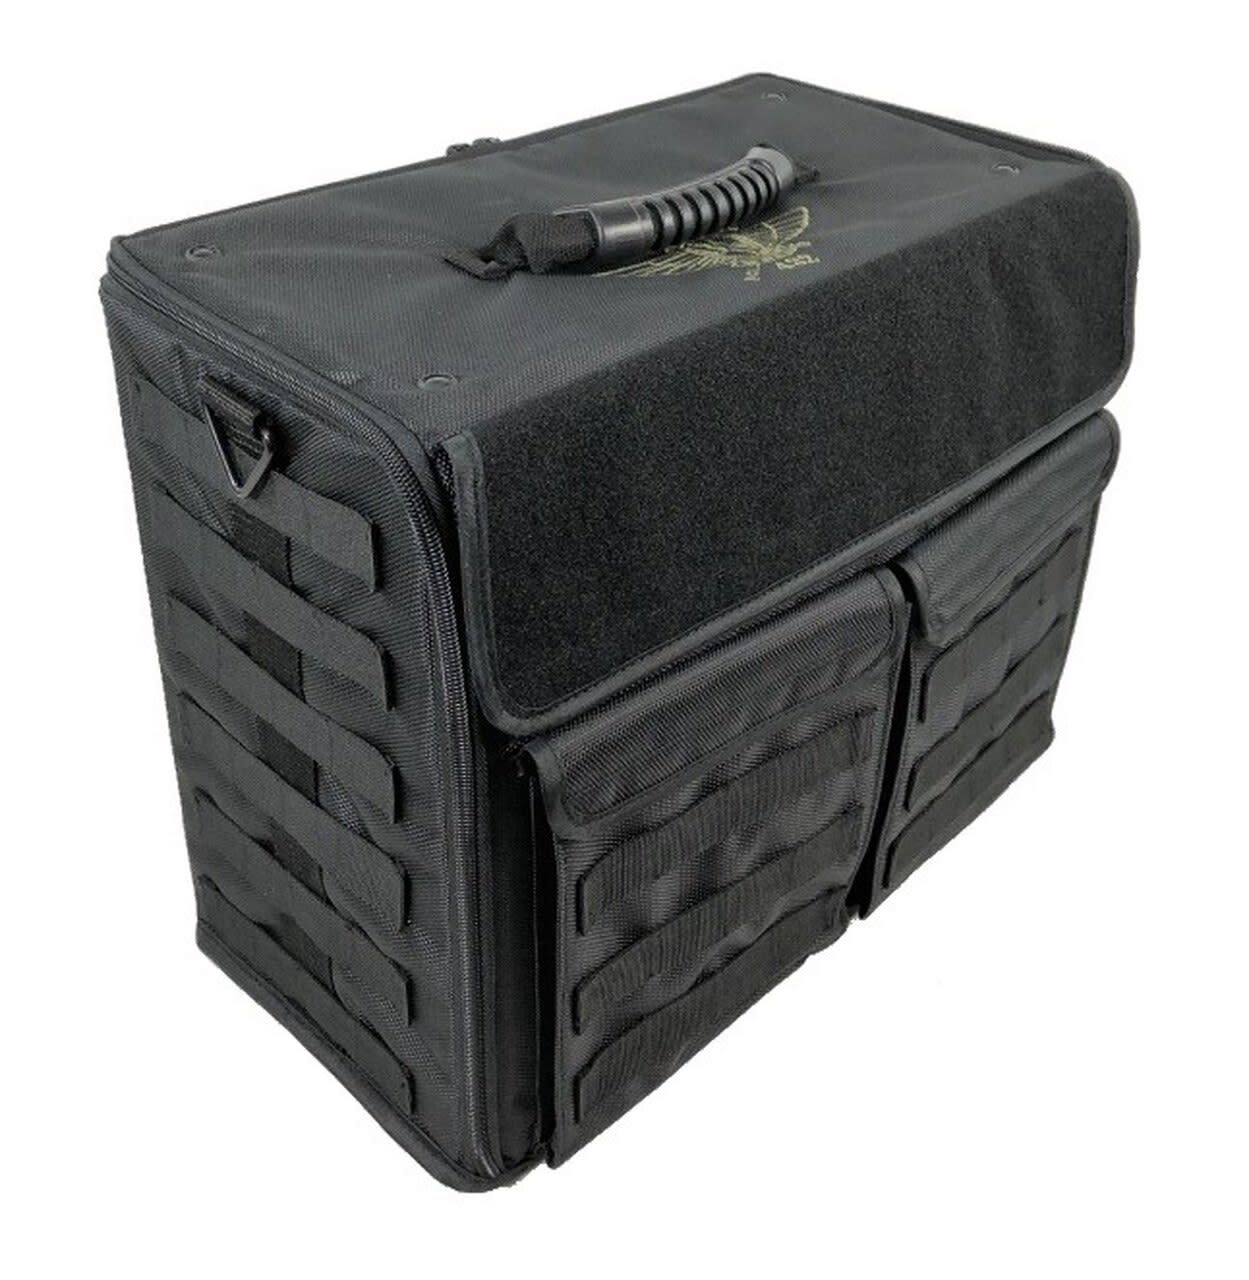 P.A.C.K. 432 Molle Vertical Standard Load Out Black